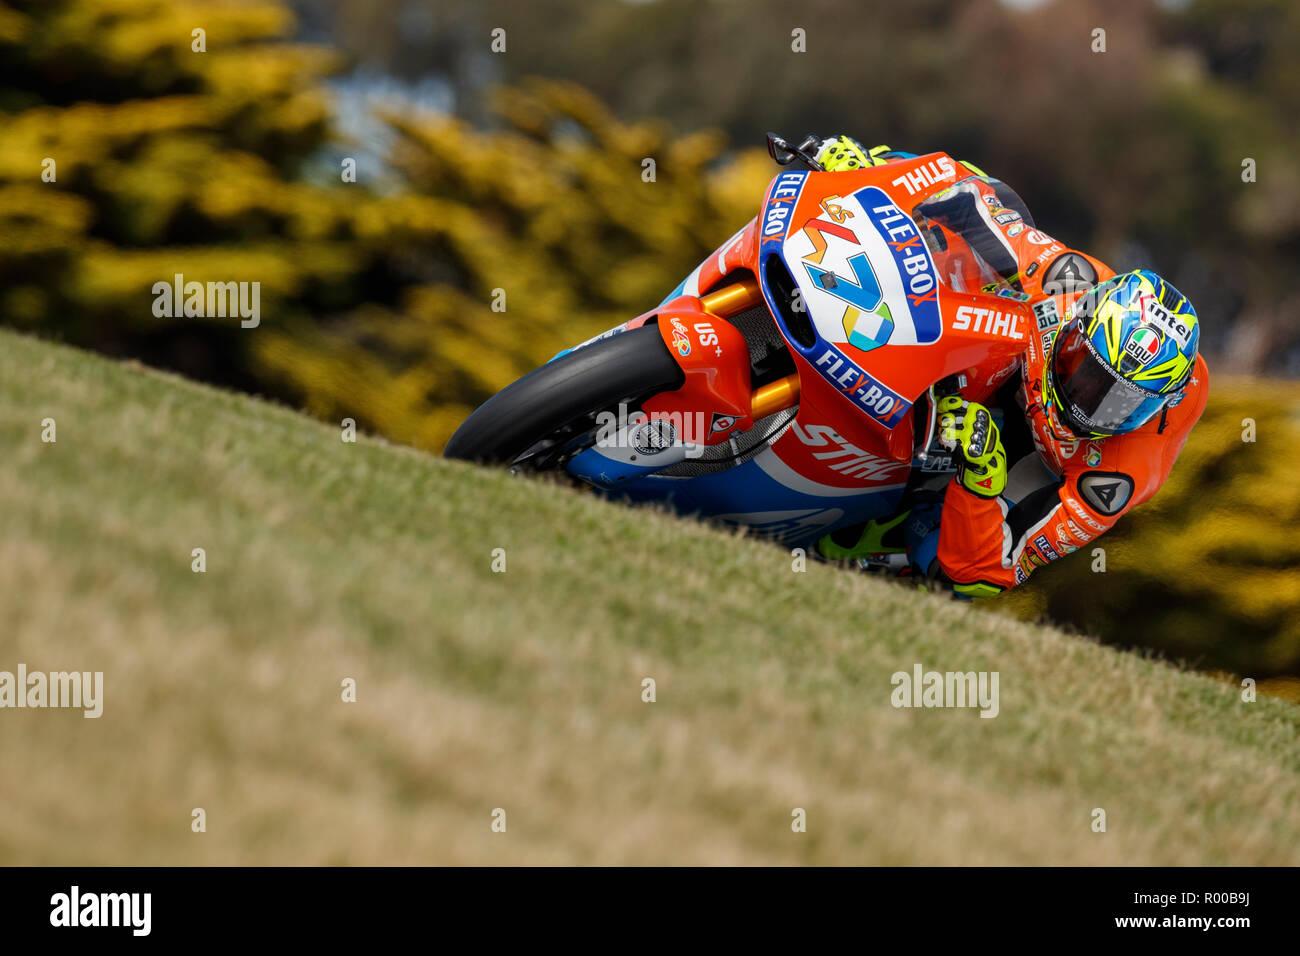 Friday, 26 October, 2018. Phillip Island, Australia. Moto2. Lorenzo Baldassarri, Pons HP Racing Moto2 Team. - Stock Image